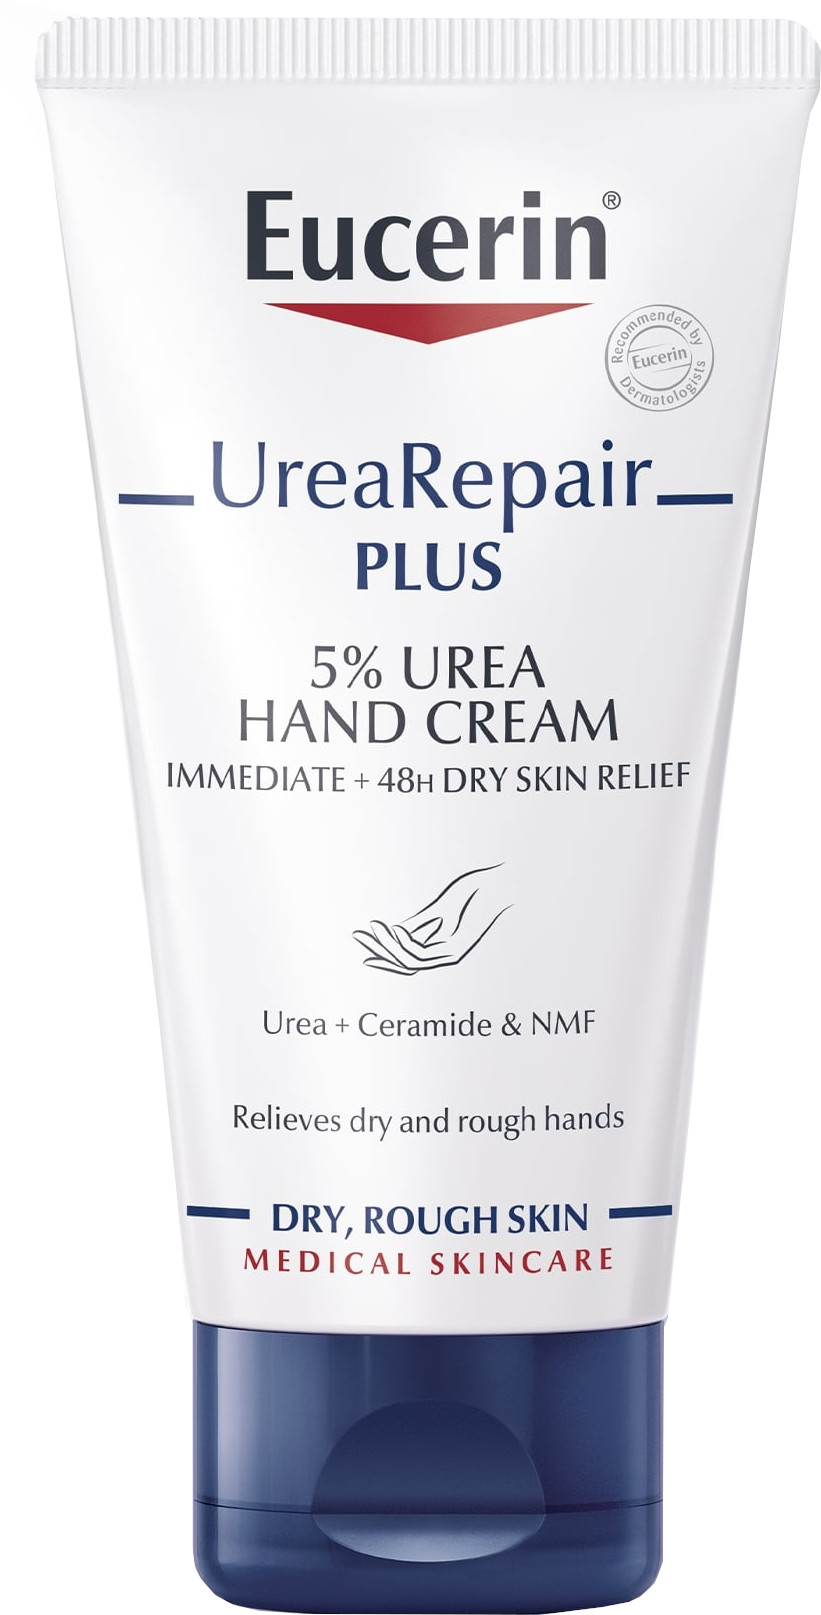 Eucerin UreaRepair PLUS Krem na ruky 5% Urea 75 ml